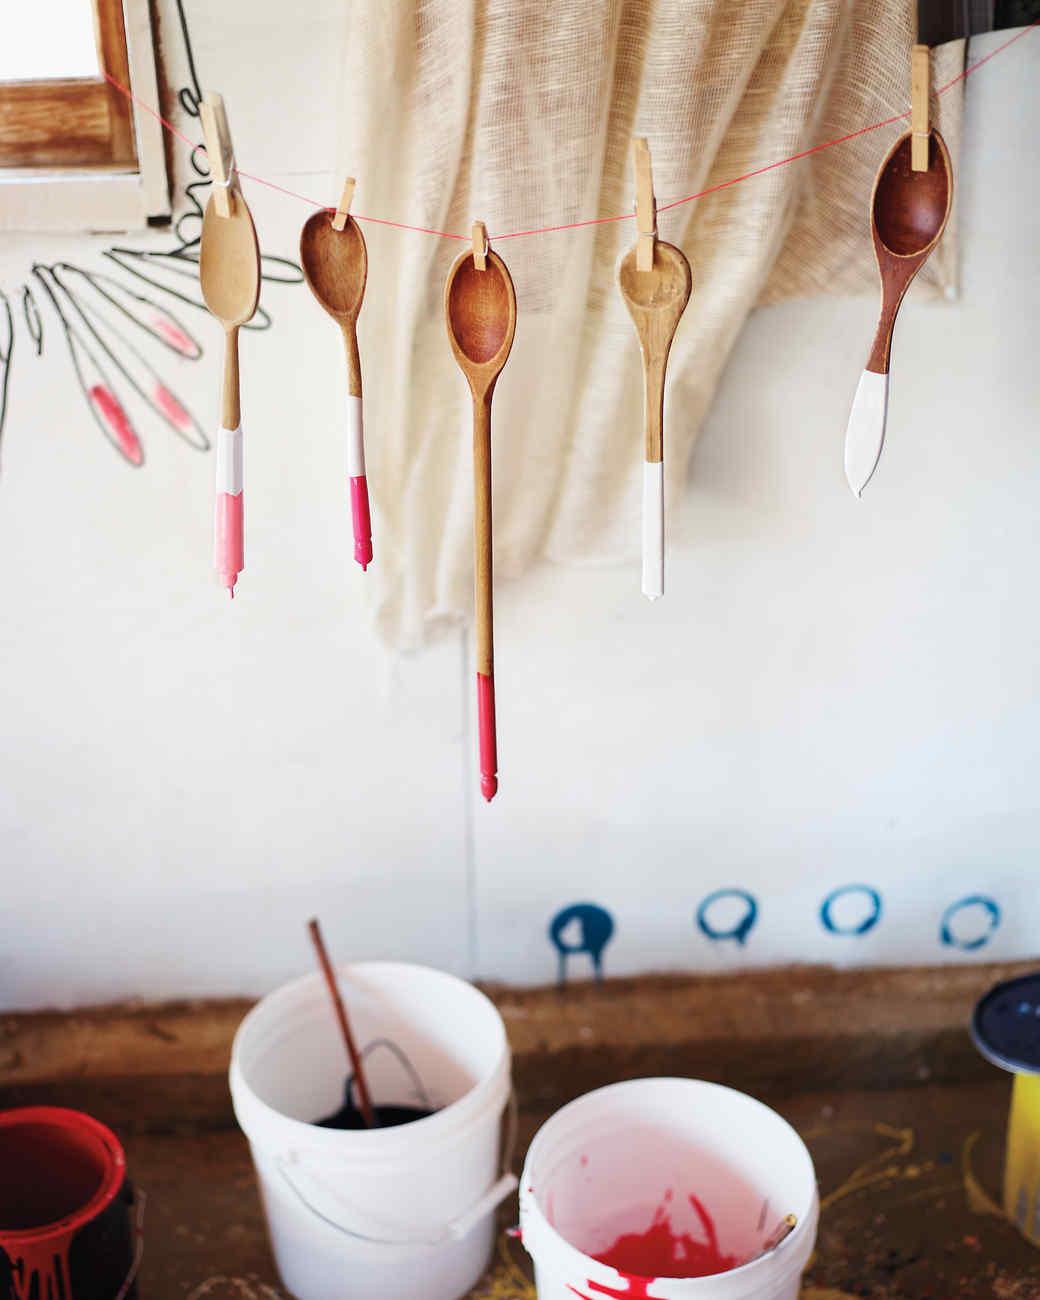 spoons-chontos-03-cf039531-ma120730.jpg